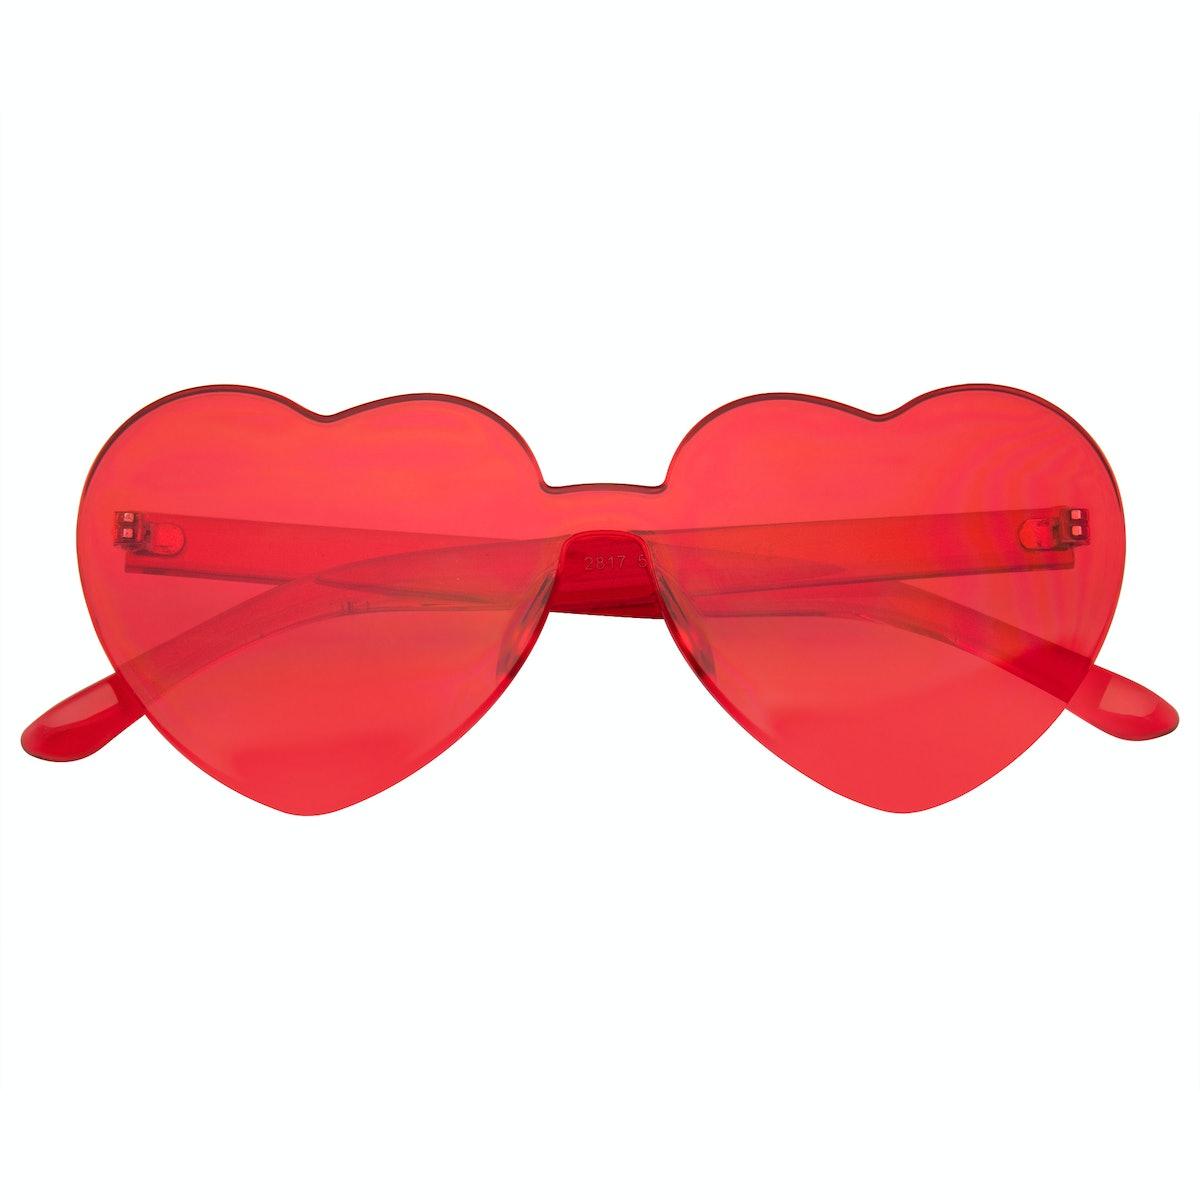 Emblem Eyewear - Heart Sunglasses